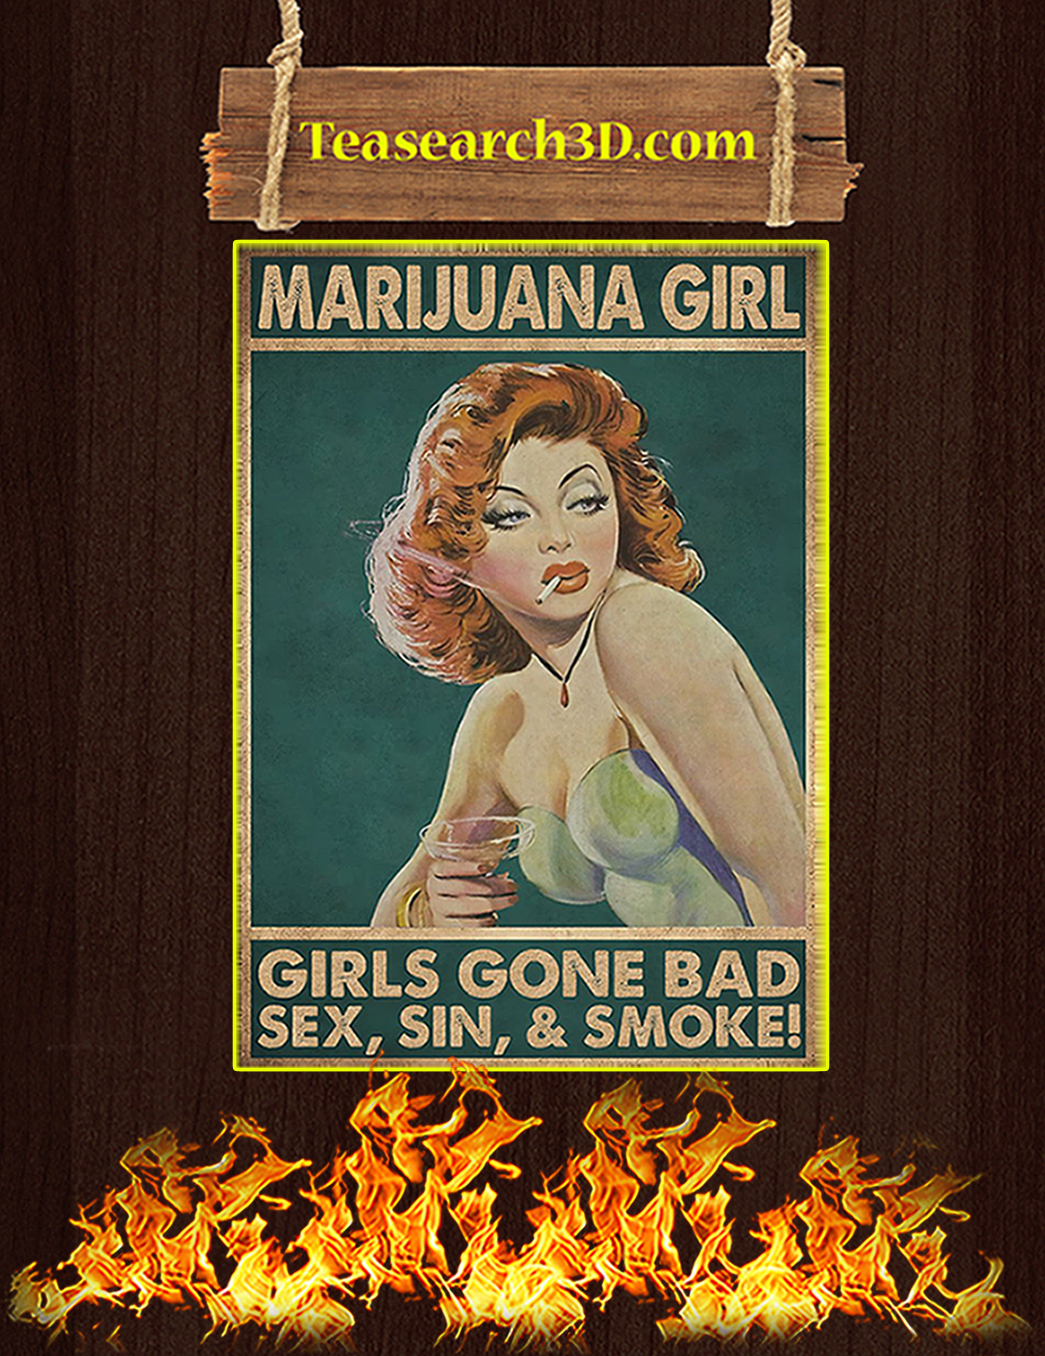 Marijuana girl girls gone bad sex sin and smoke poster A1